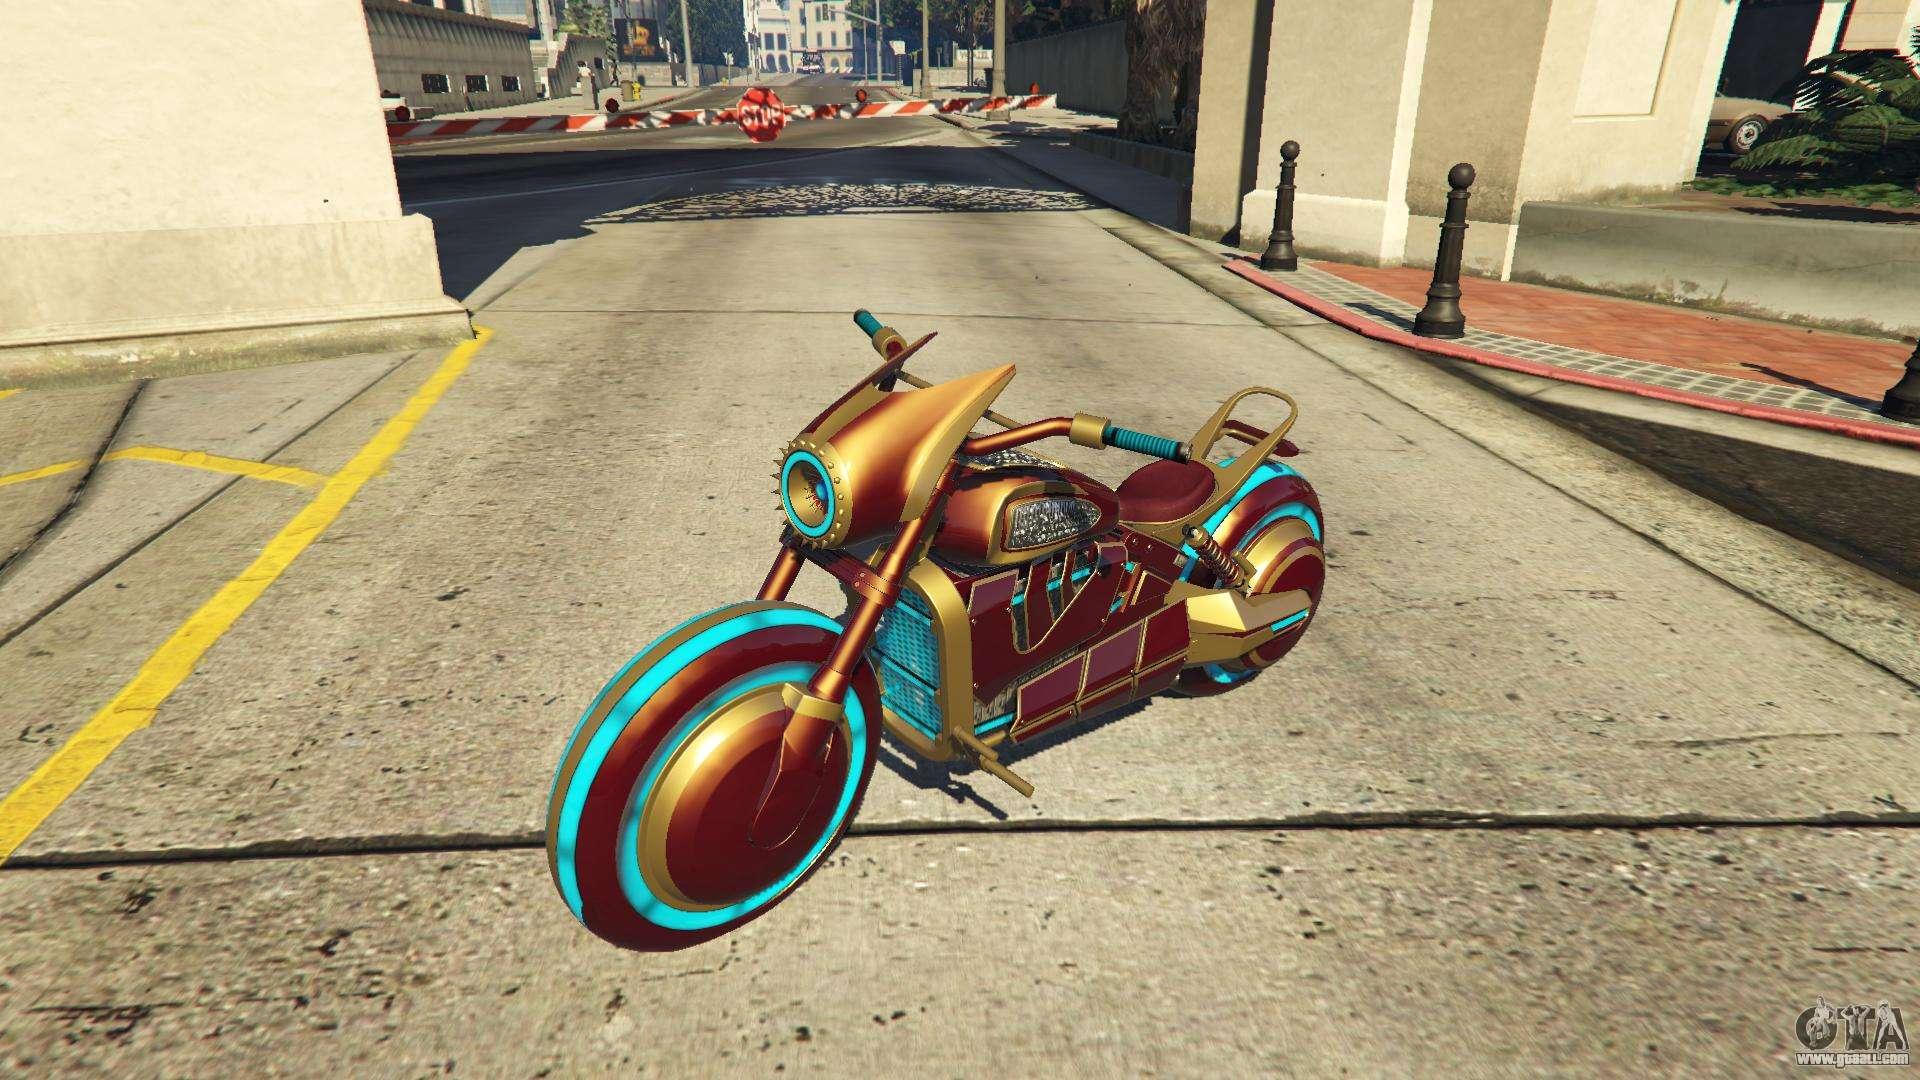 Future Shock bike, the variant of the Deathbike